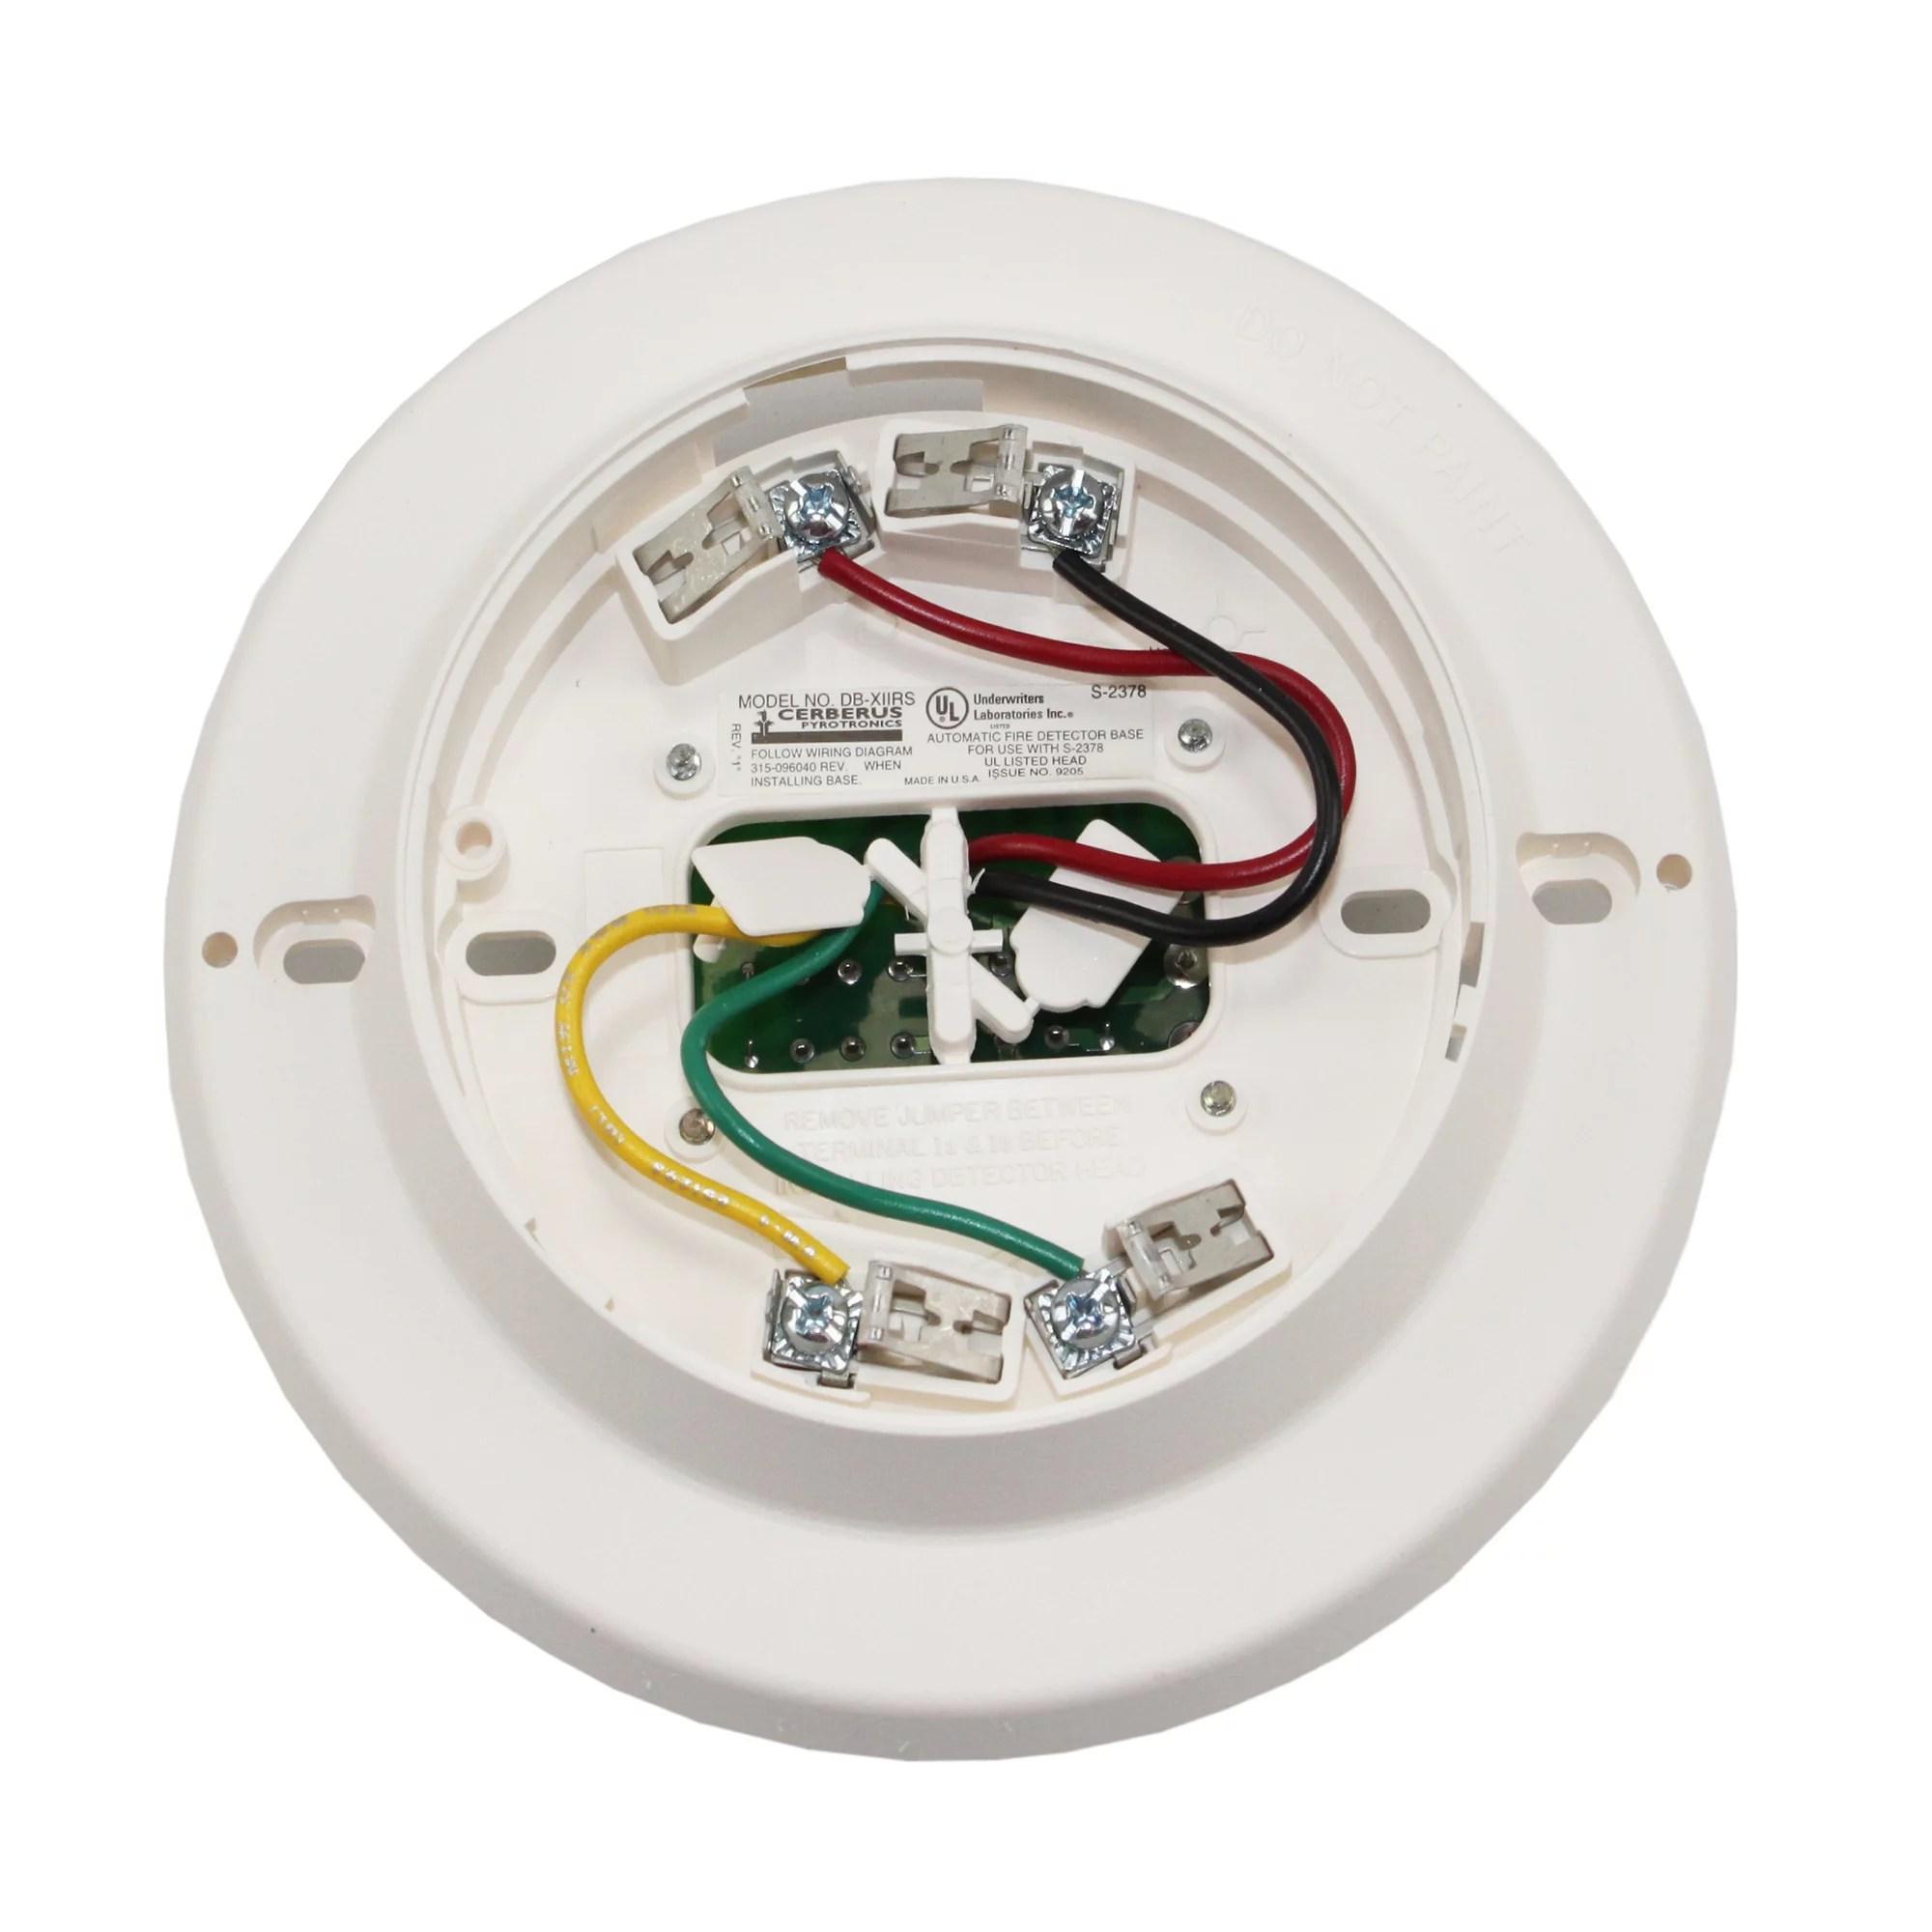 hight resolution of siemens db x11rs fire alarm smoke detector relay base 500 096125 white walmart com